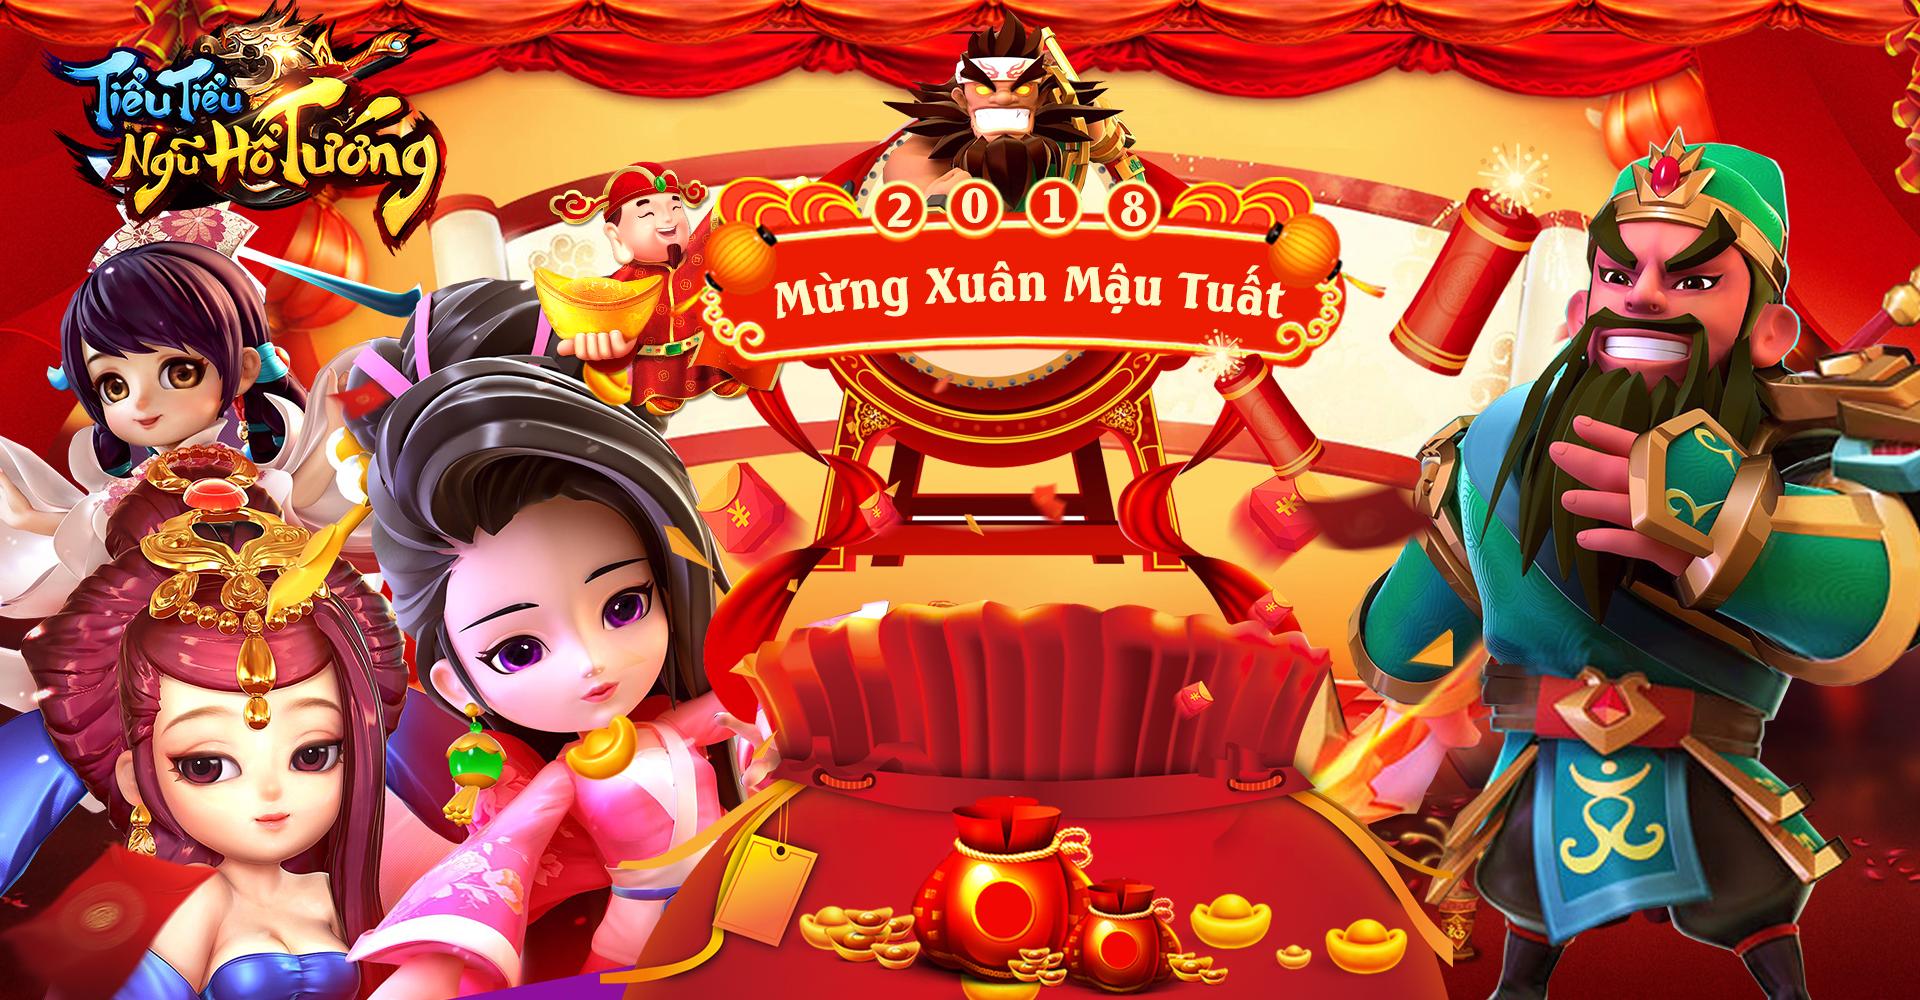 su-kien-chuoi-su-kien-nau-banh-chung-mung-tet-nguyen-dan-12-02-18-02